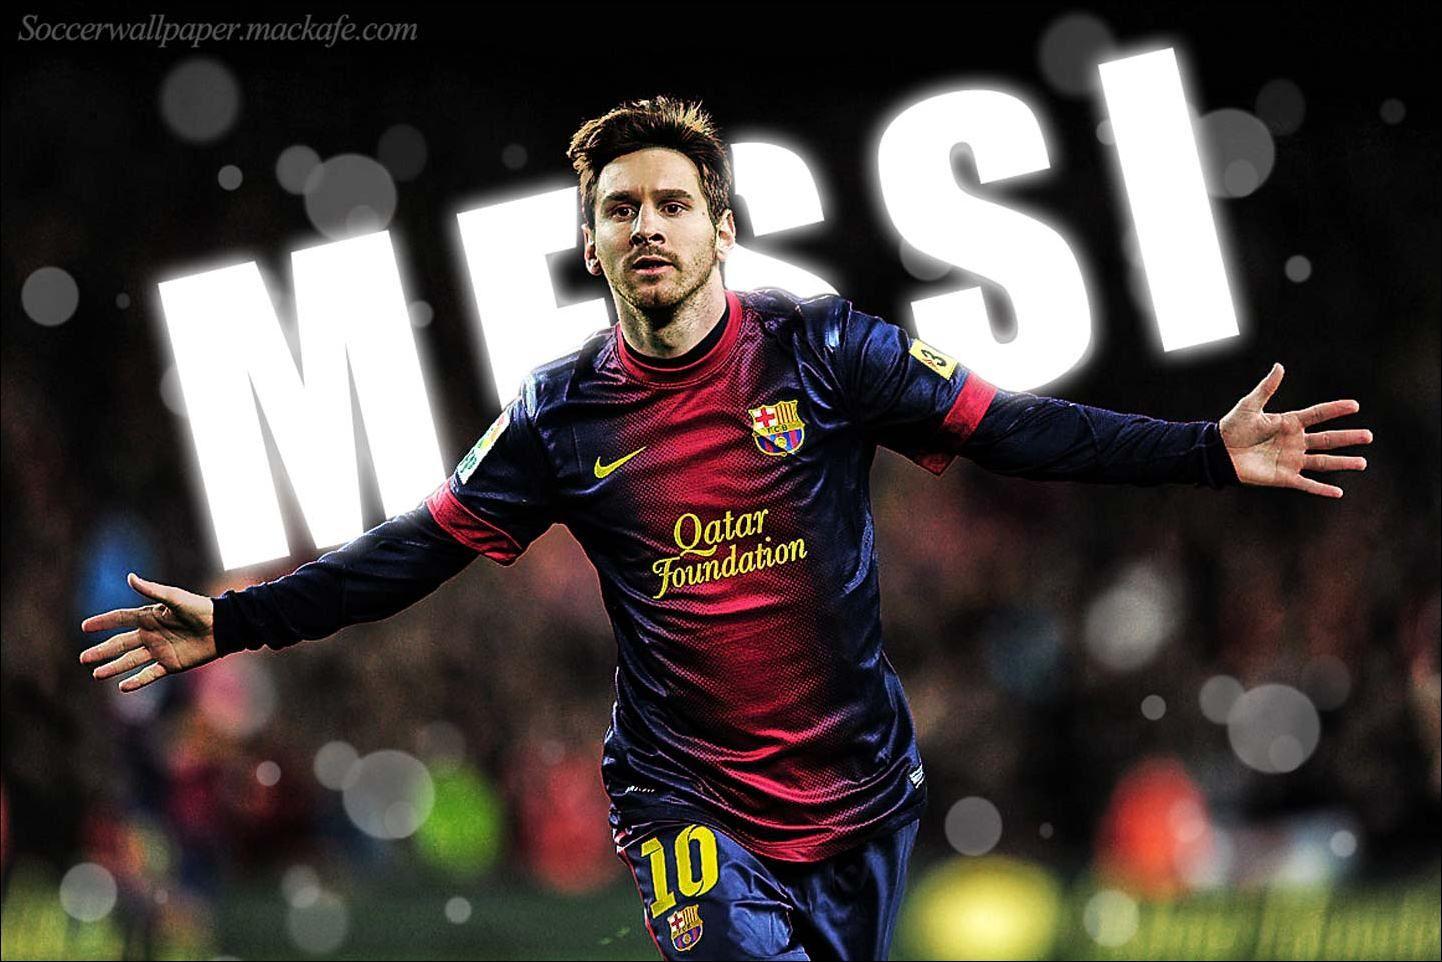 футбол 1 Wallpaper: Lionel Messi Wallpaper Background Download HD